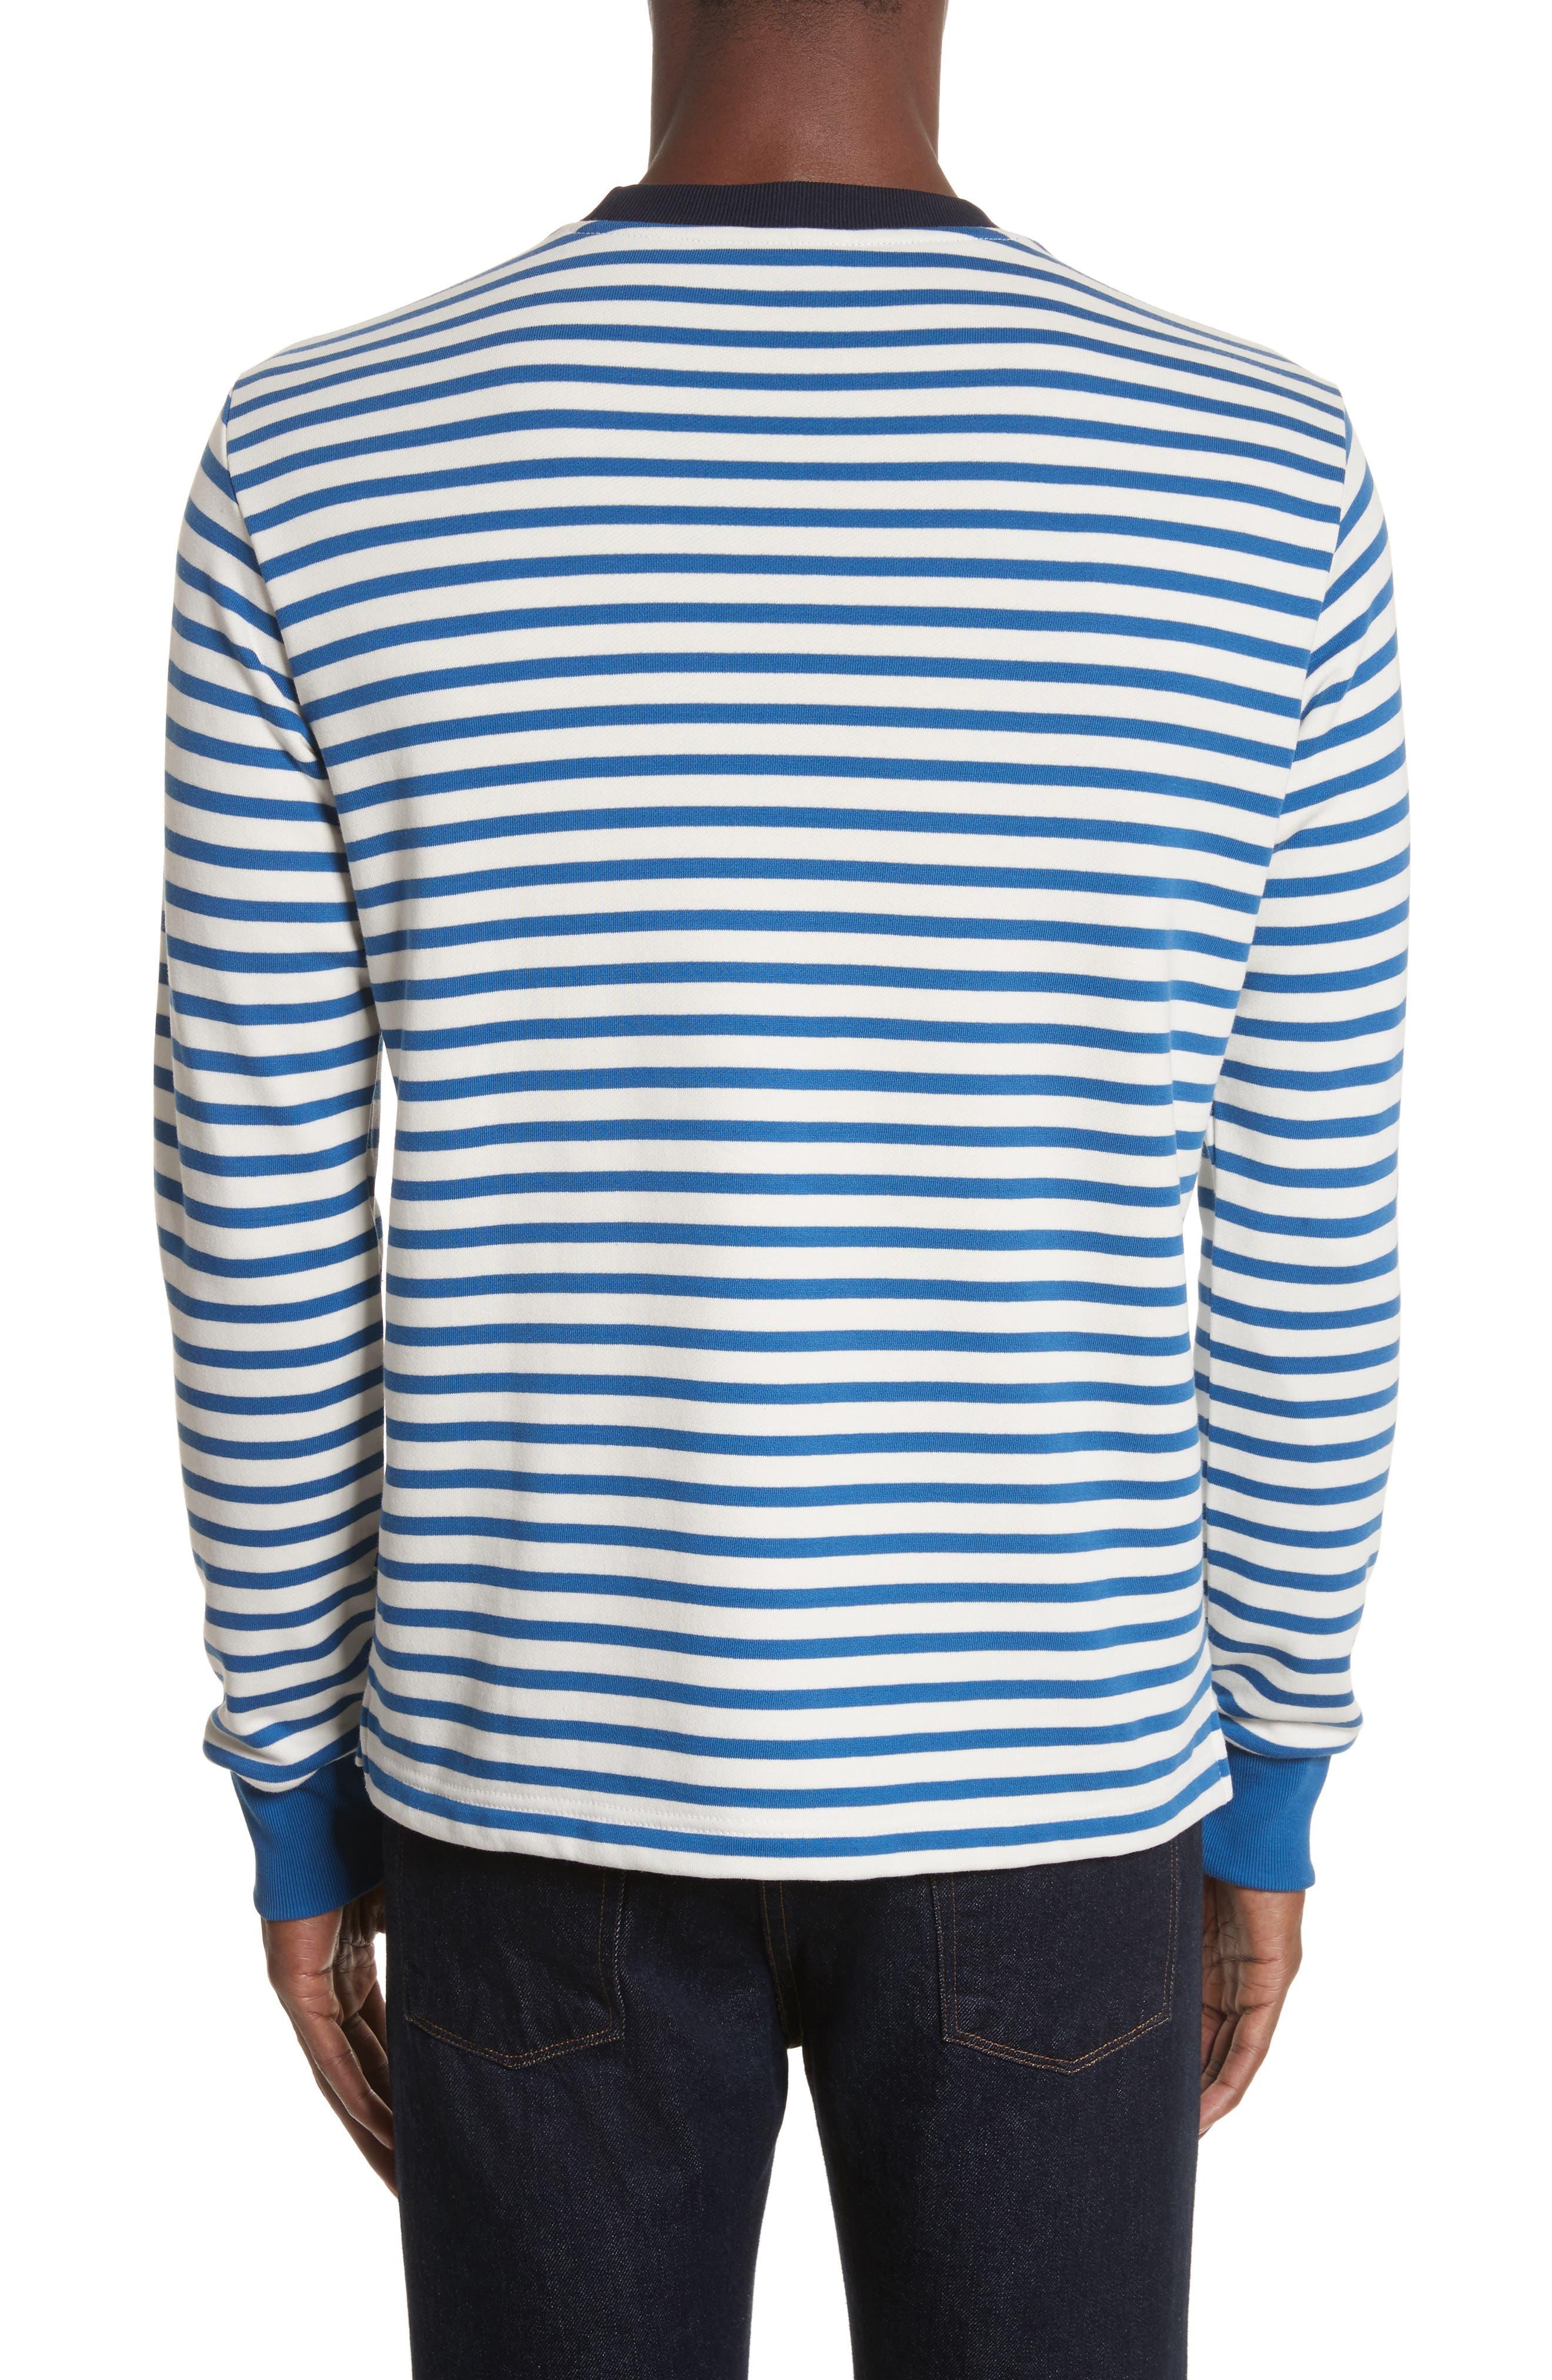 Stripe Crewneck Sweatshirt,                             Alternate thumbnail 2, color,                             Indigo